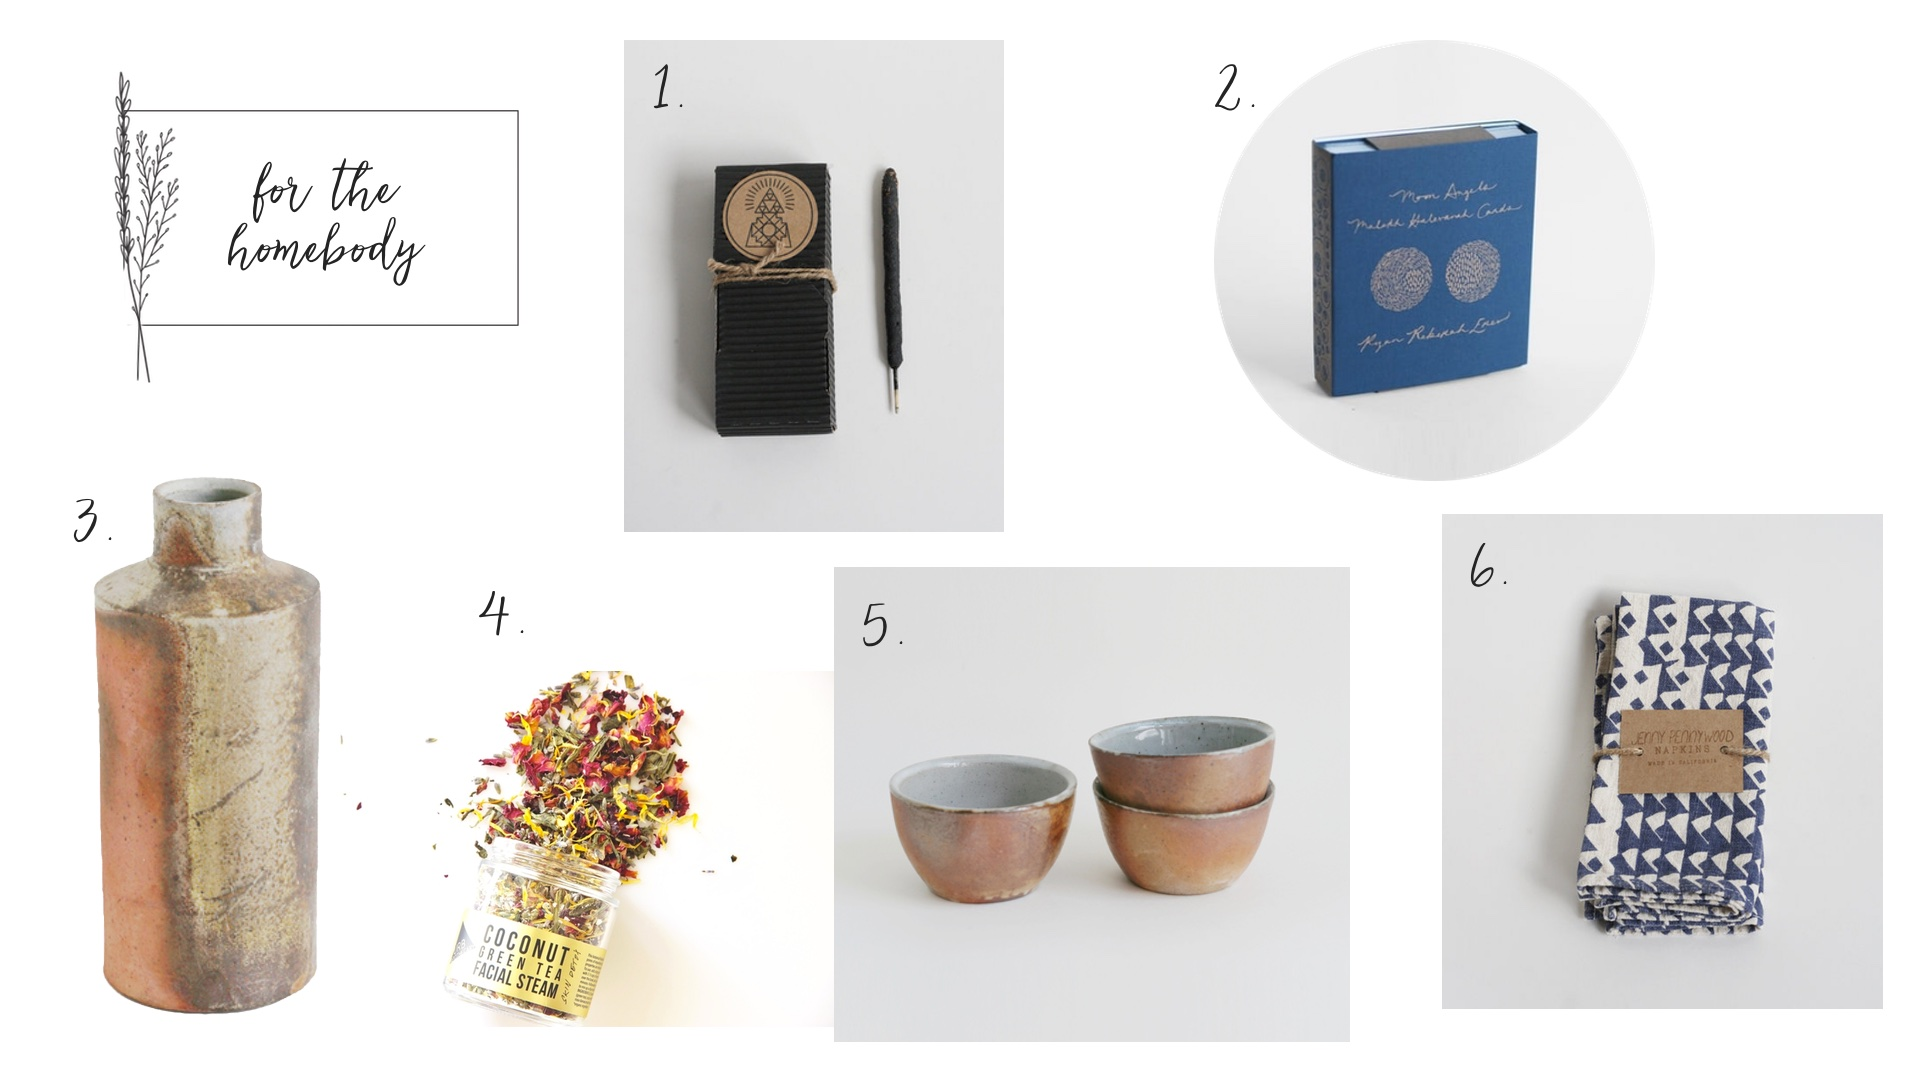 1.  Palo Santo Incense  2.  Moon Angel Deck  3.  Earthy   Vessel  4.  Herbal Facial Steam  5.  Coffee Bowls  6.  Indigo Triangle Napkins